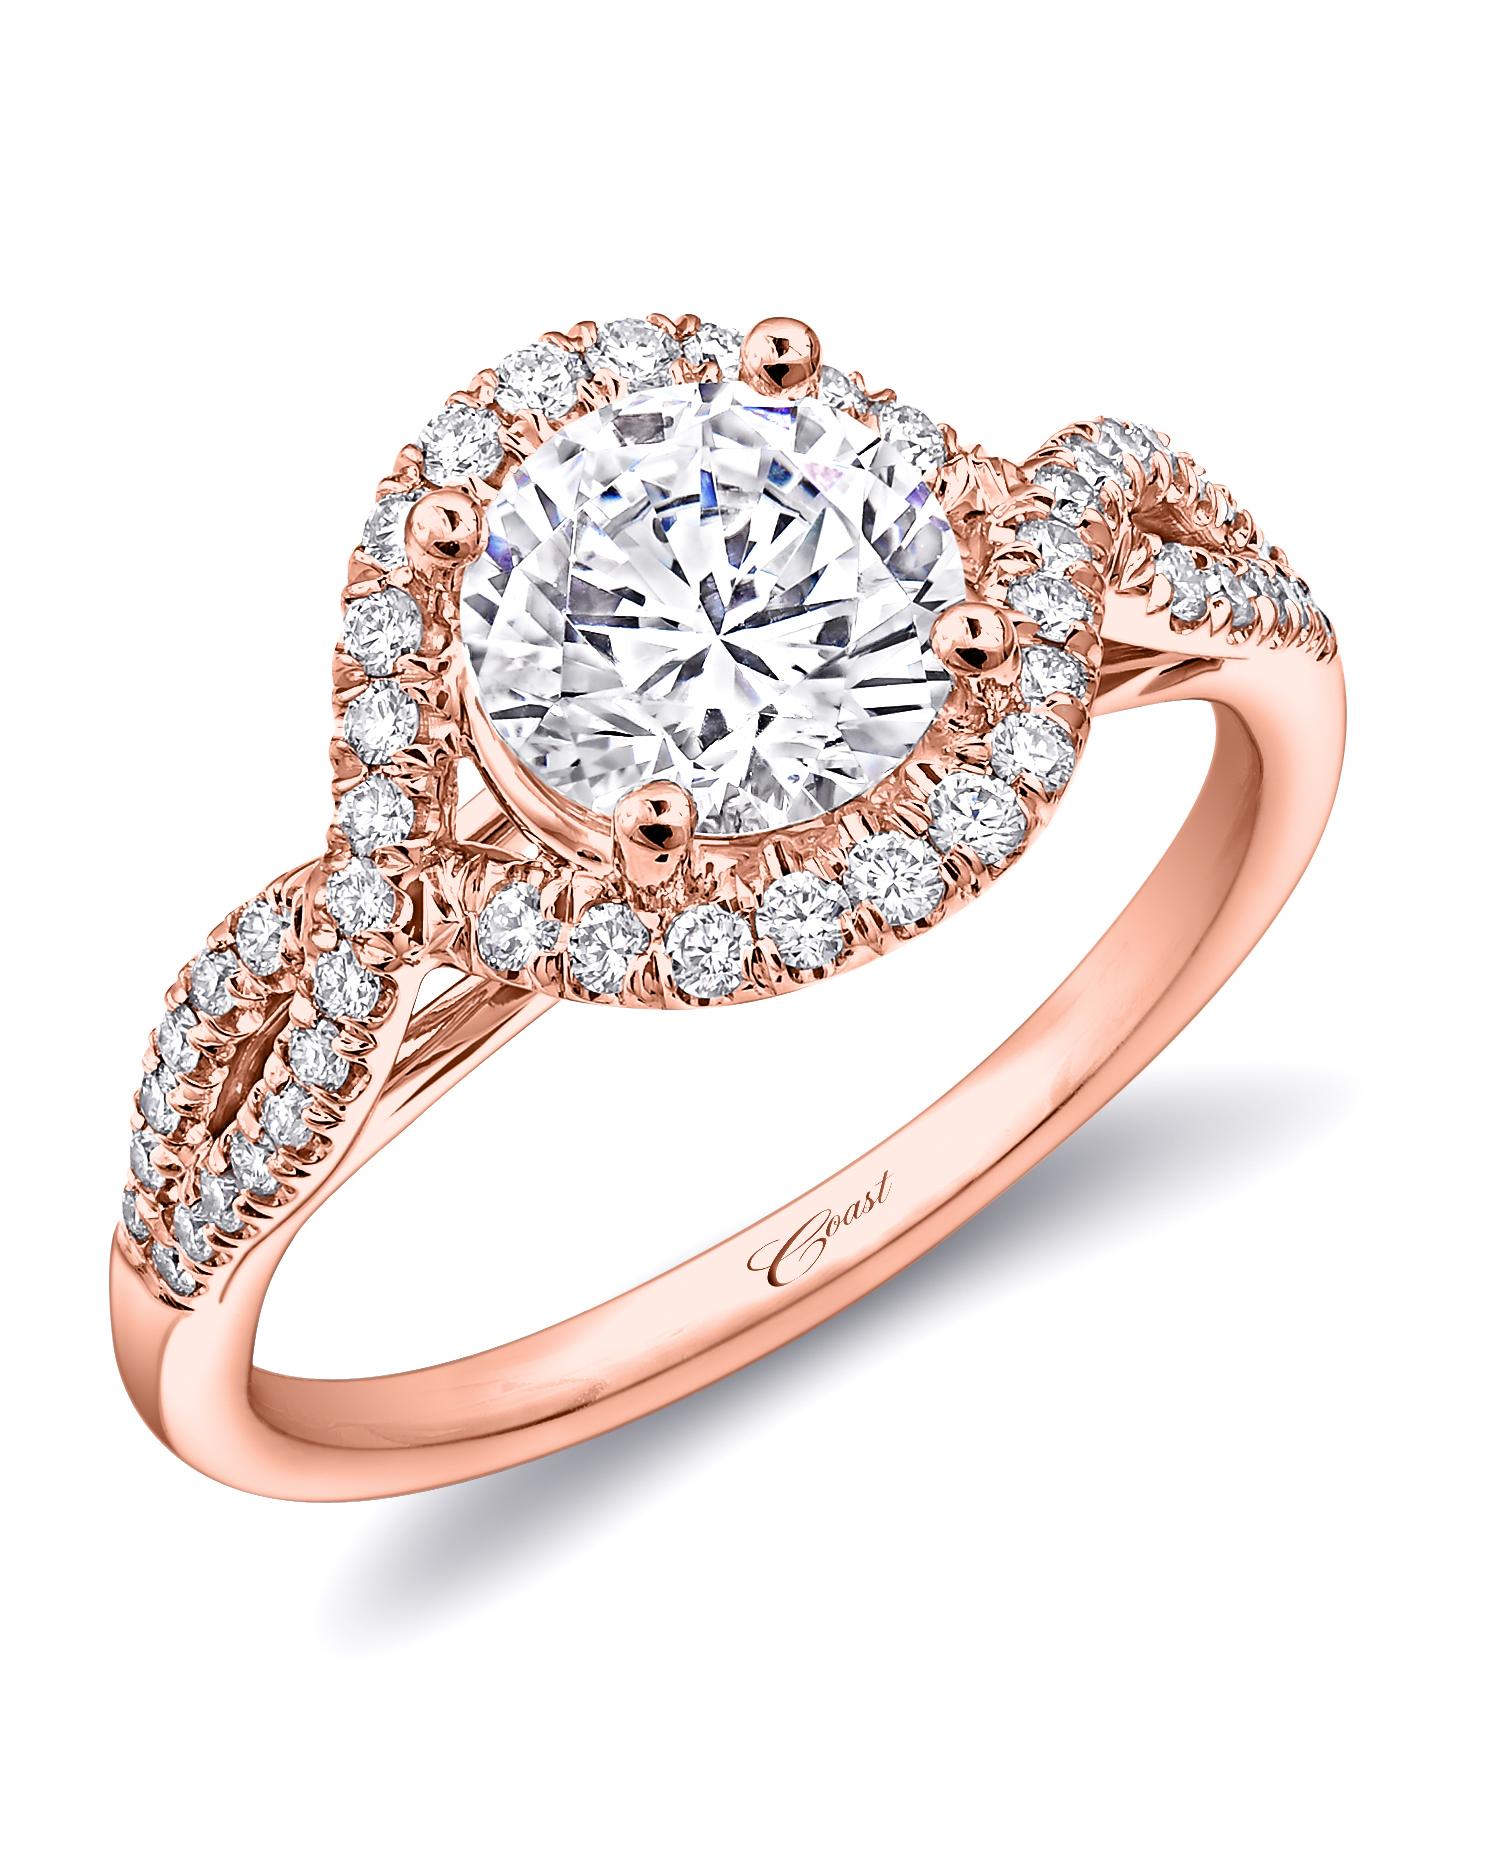 coast-diamond-rose-gold-lc5449-halo-fishtail-setting-engagement-ring-0816.jpg